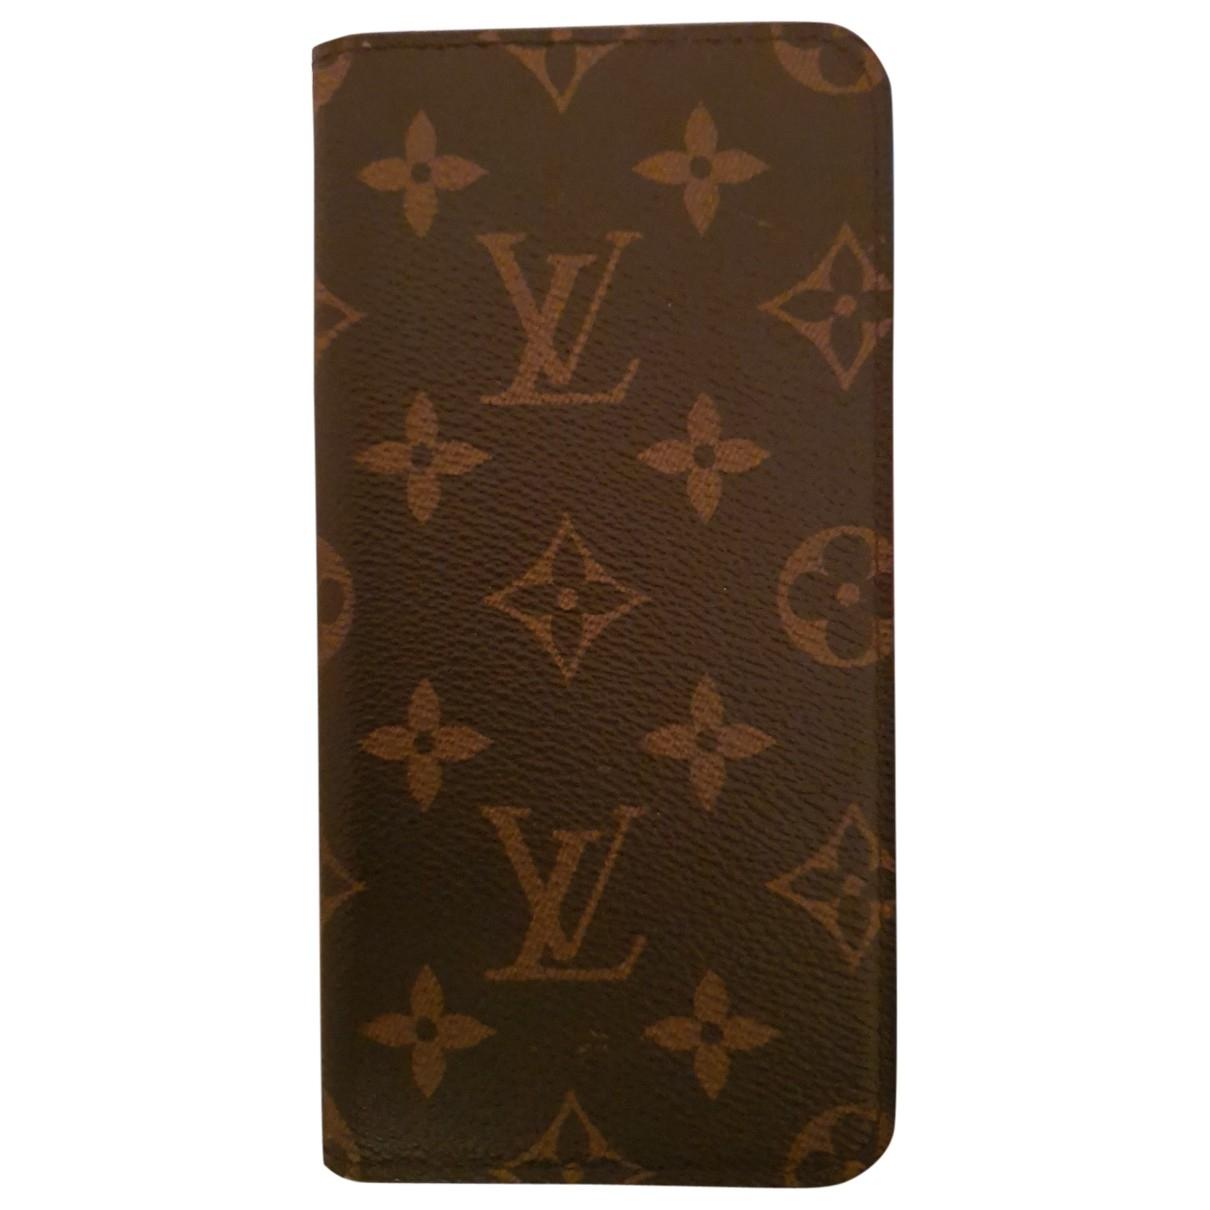 Louis Vuitton \N Brown Cloth Accessories for Life & Living \N